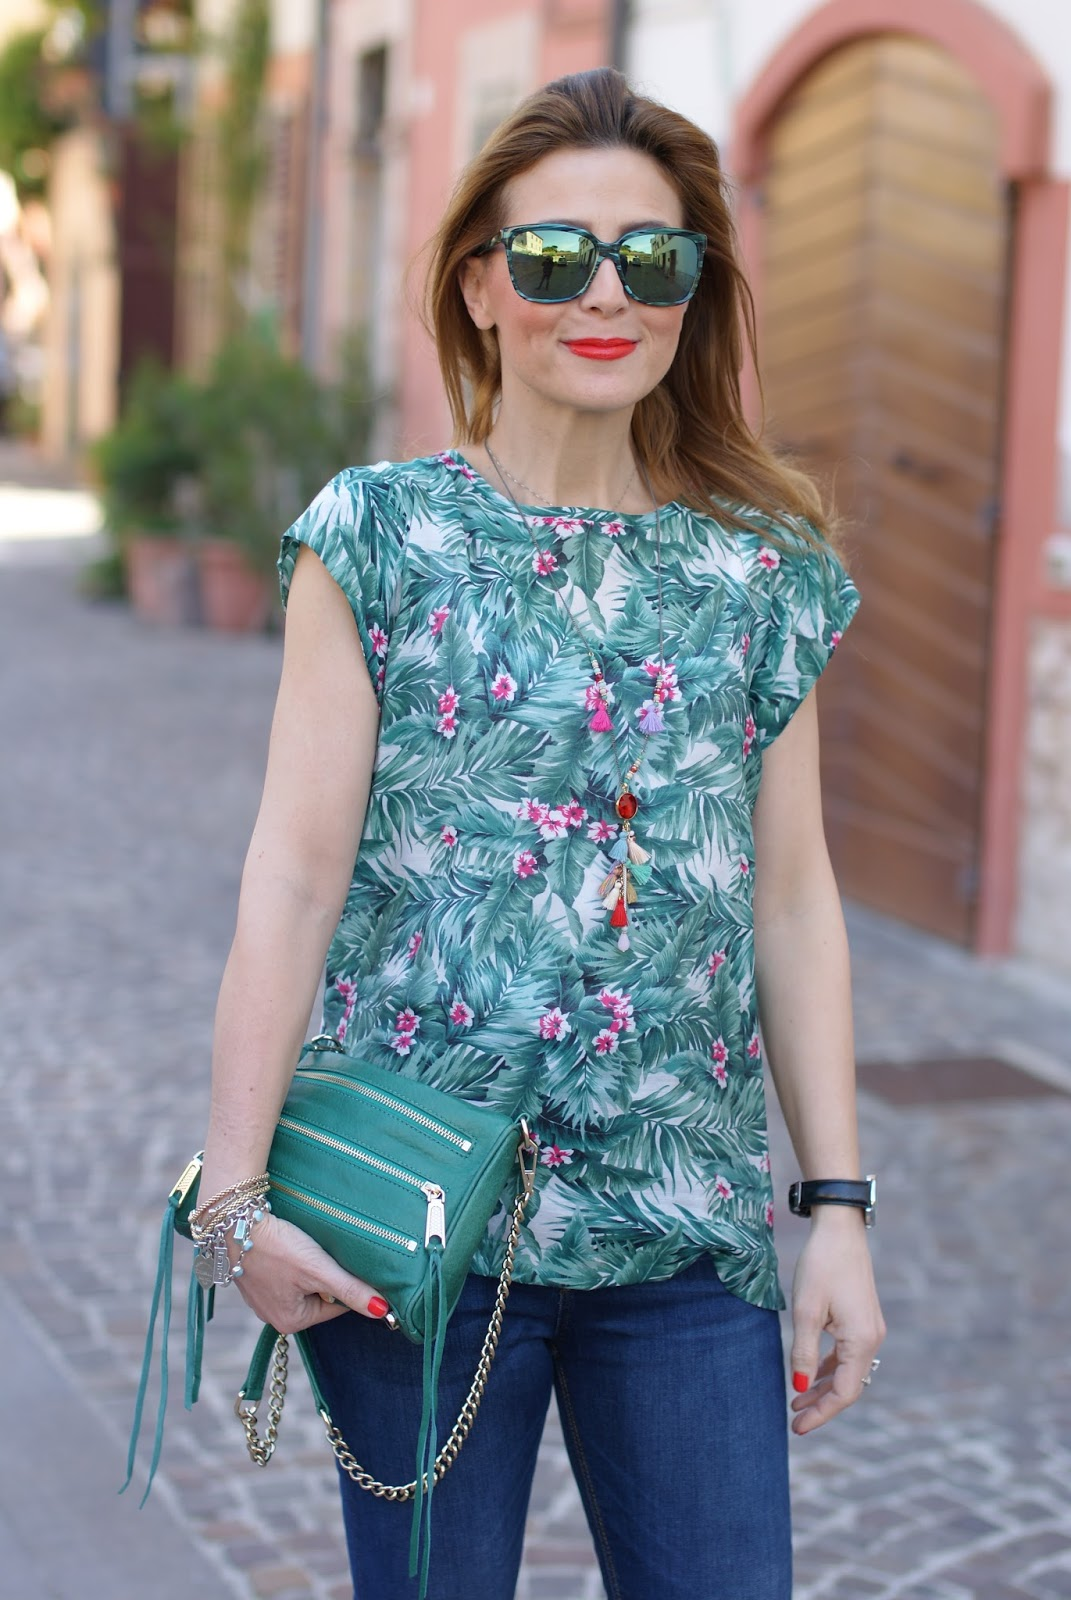 Rebecca Minkoff bag and Mismash Askani t-shirt on Fashion and Cookies fashion blog, fashion blogger style